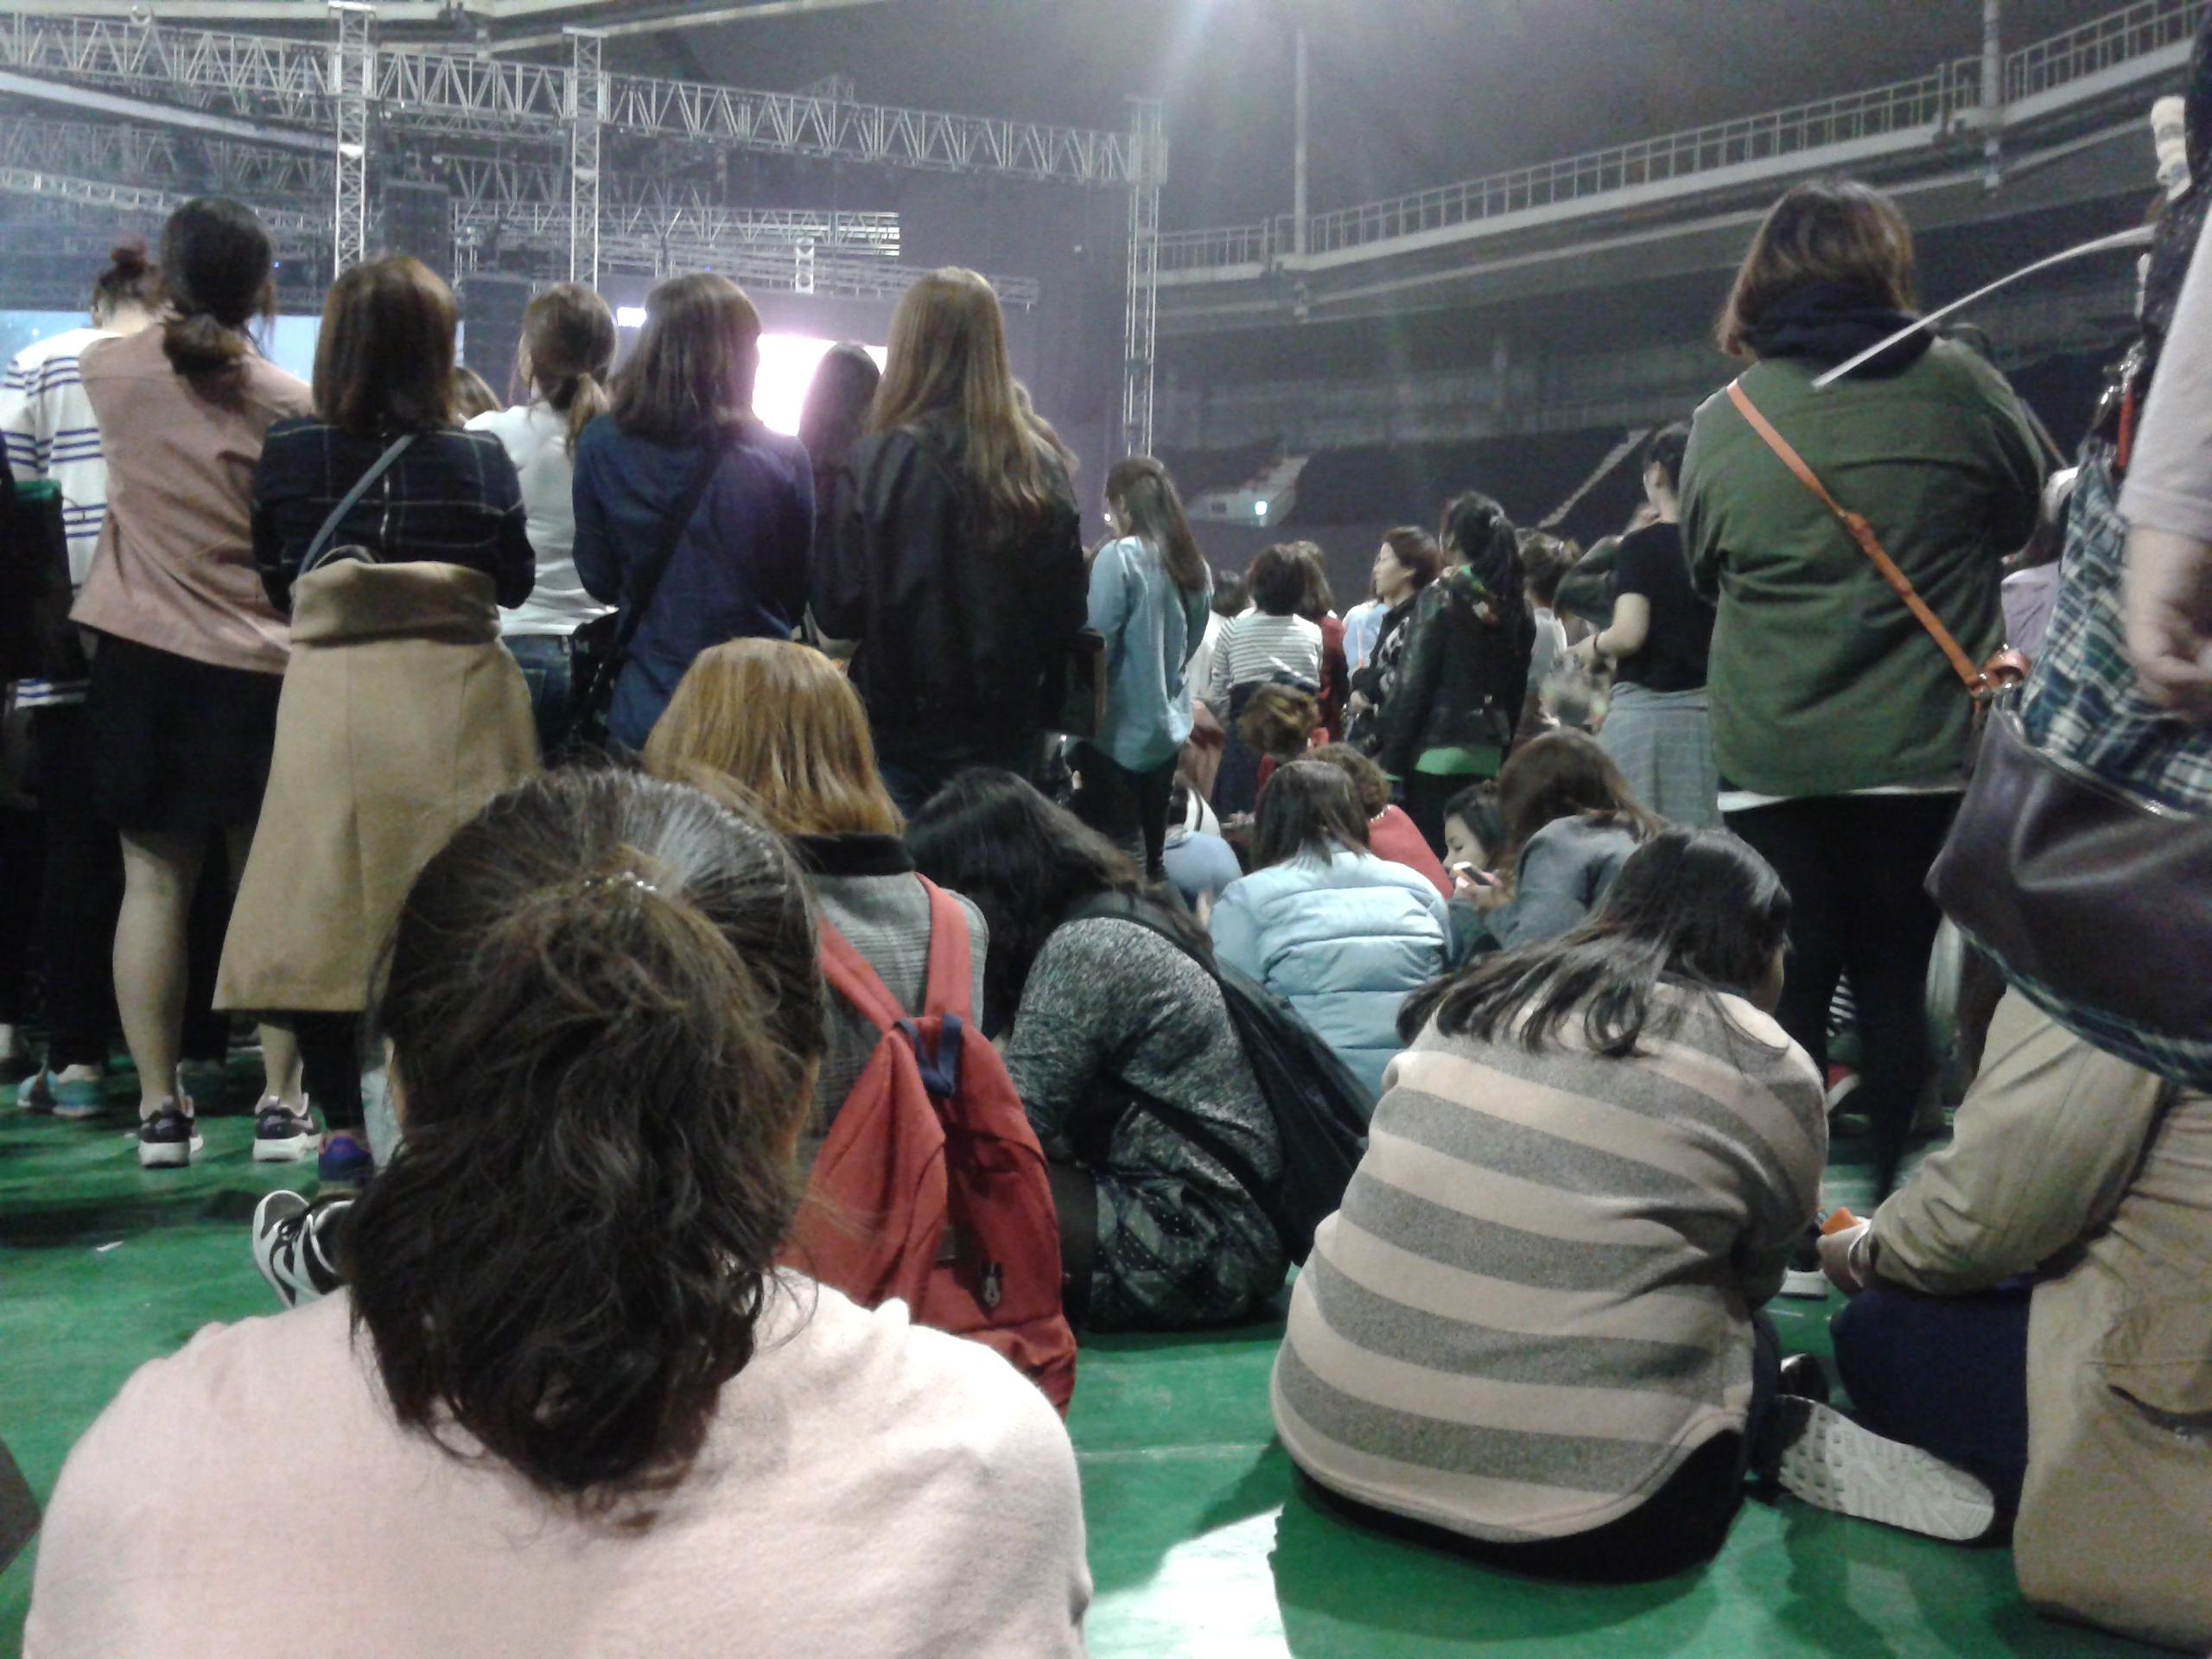 Fa 150322 shinhwa 17th anniversary concert crabbielife for 17th floor concert schedule